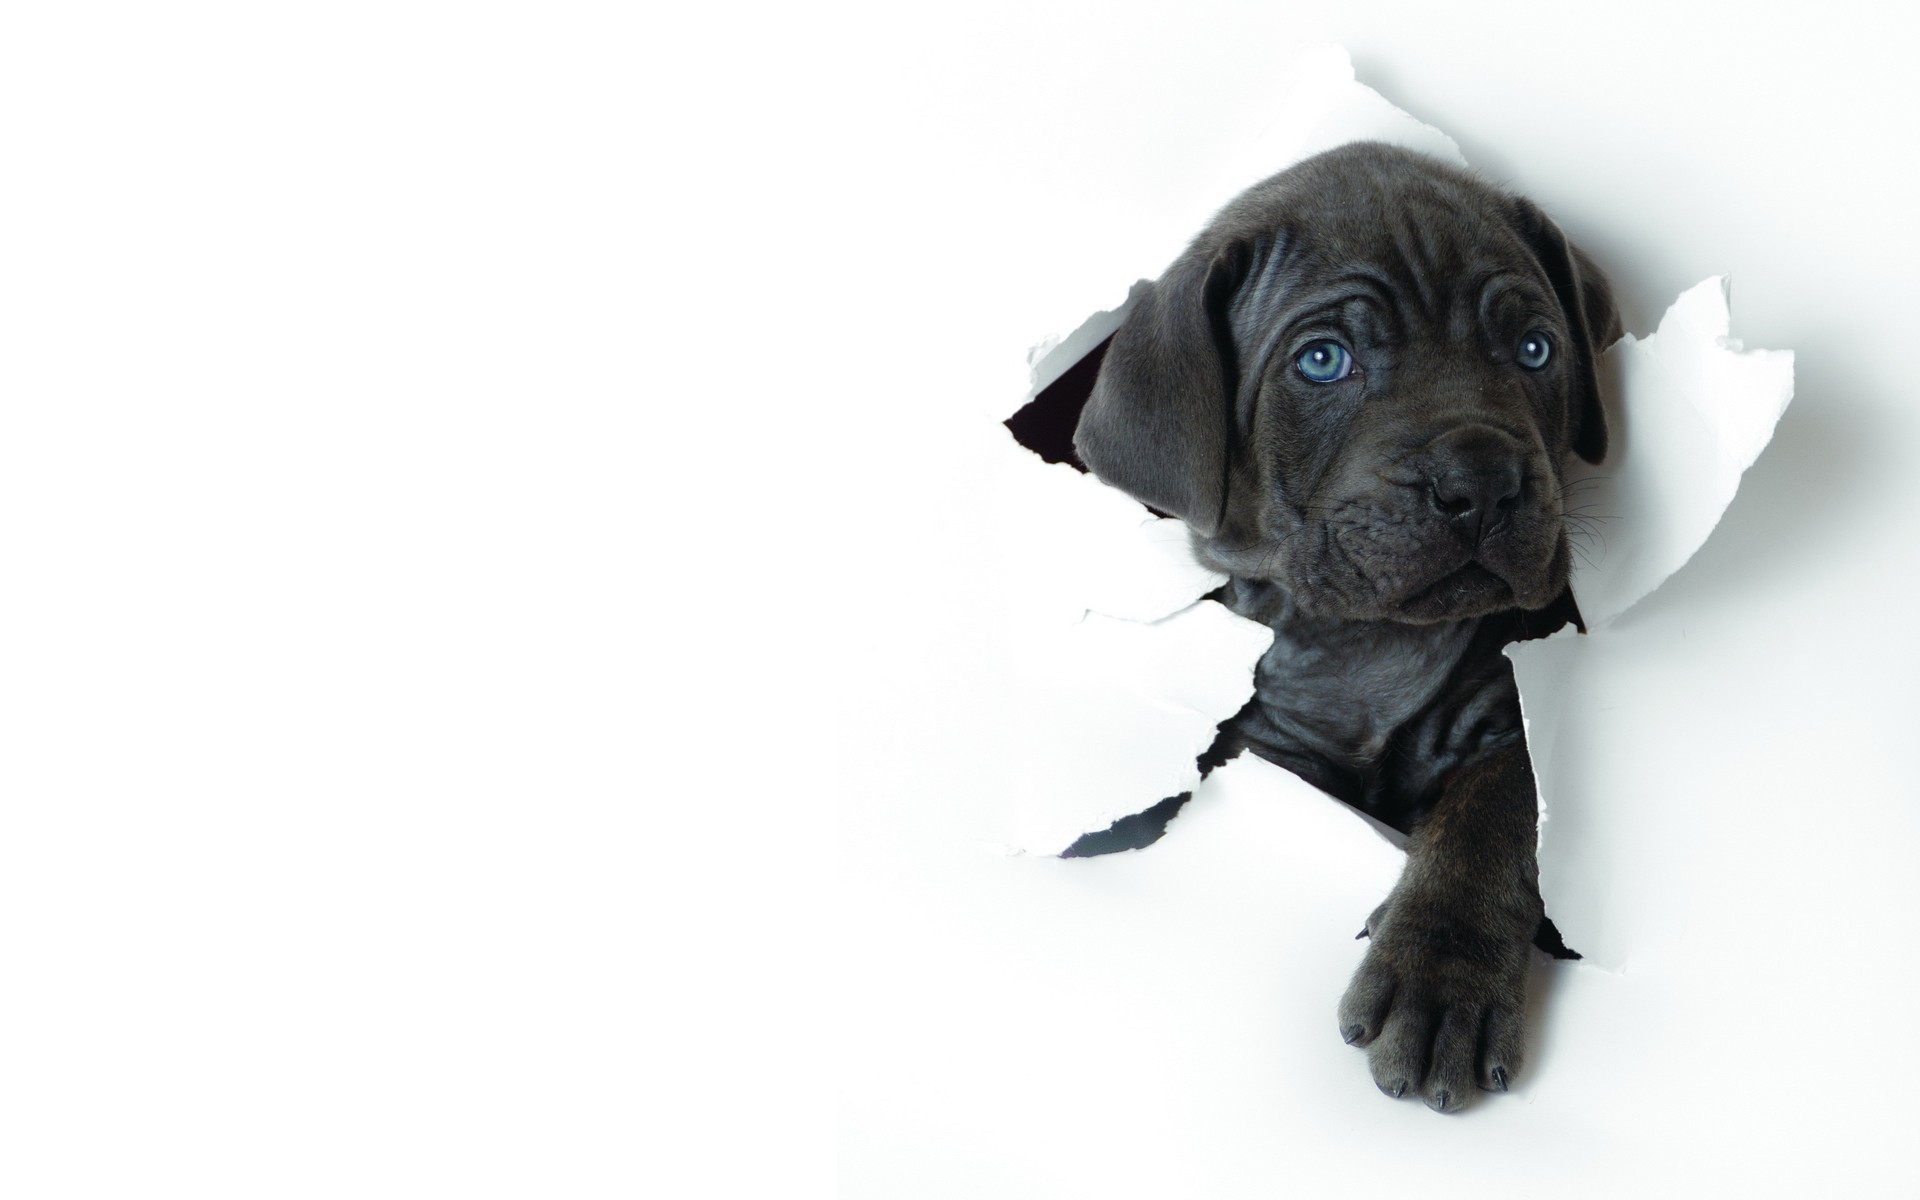 Black dog and white wallpaper